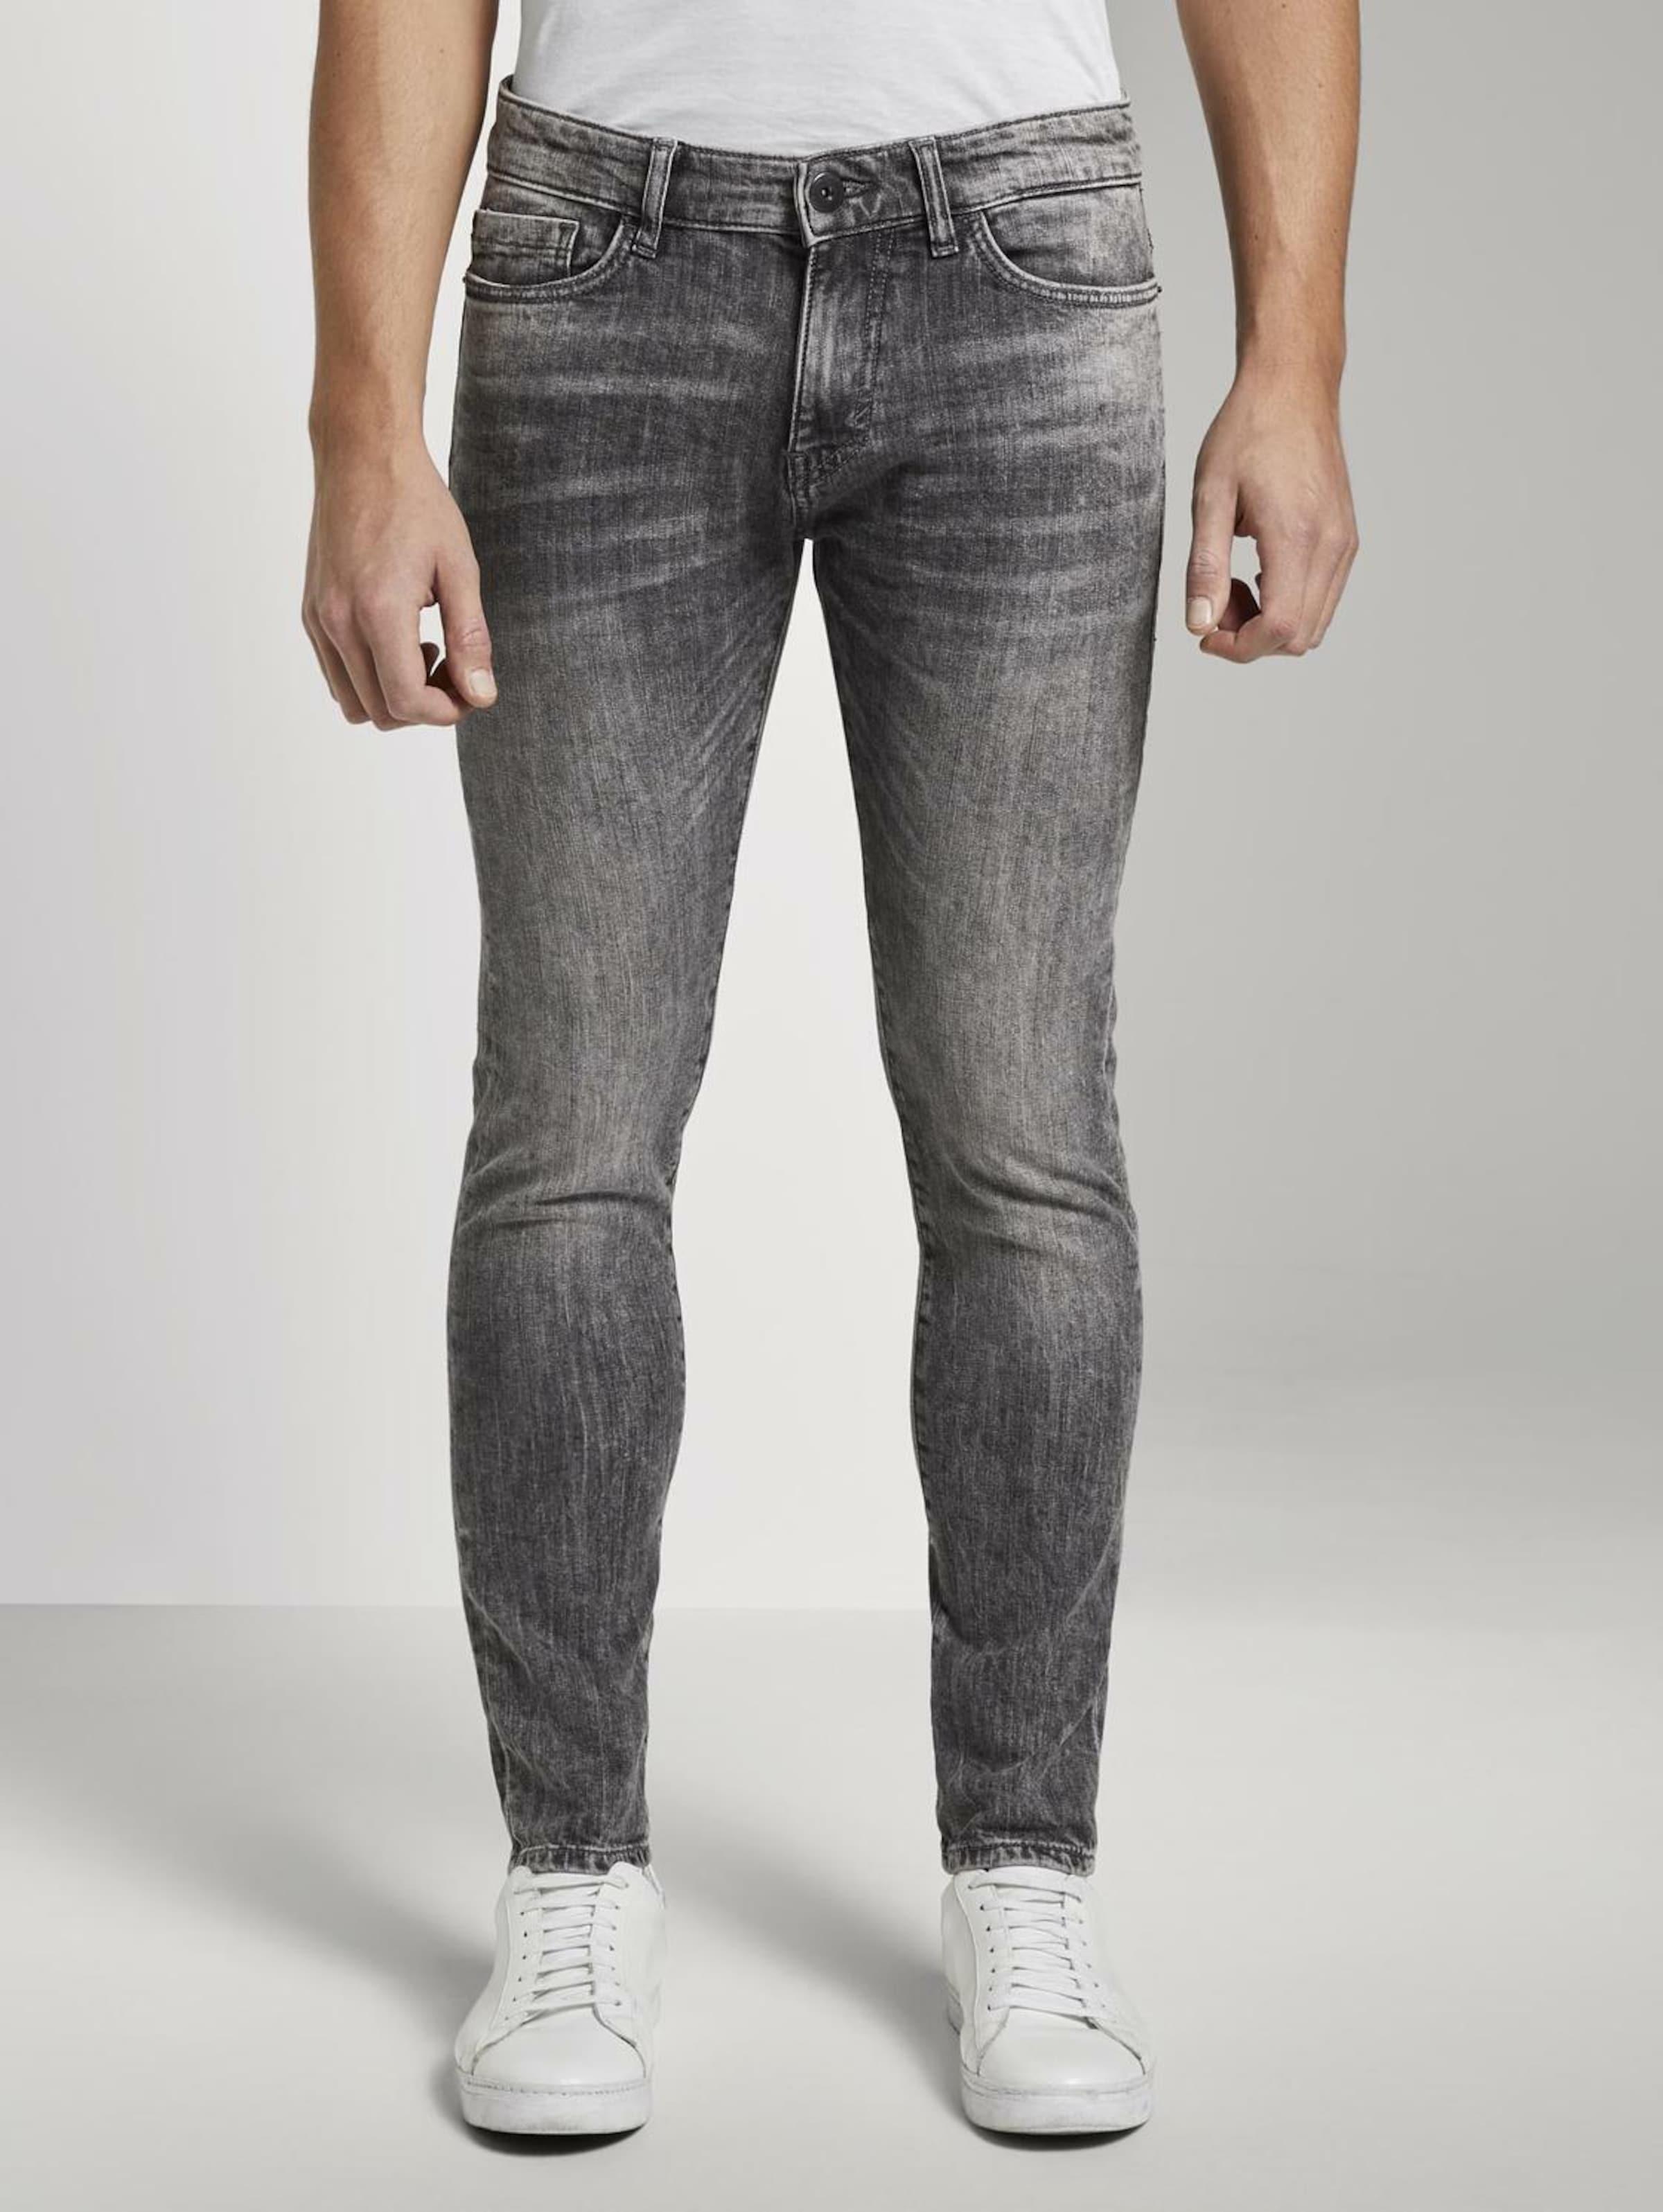 TOM TAILOR Jeans 'Troy' in grey denim Unifarben 1016696038